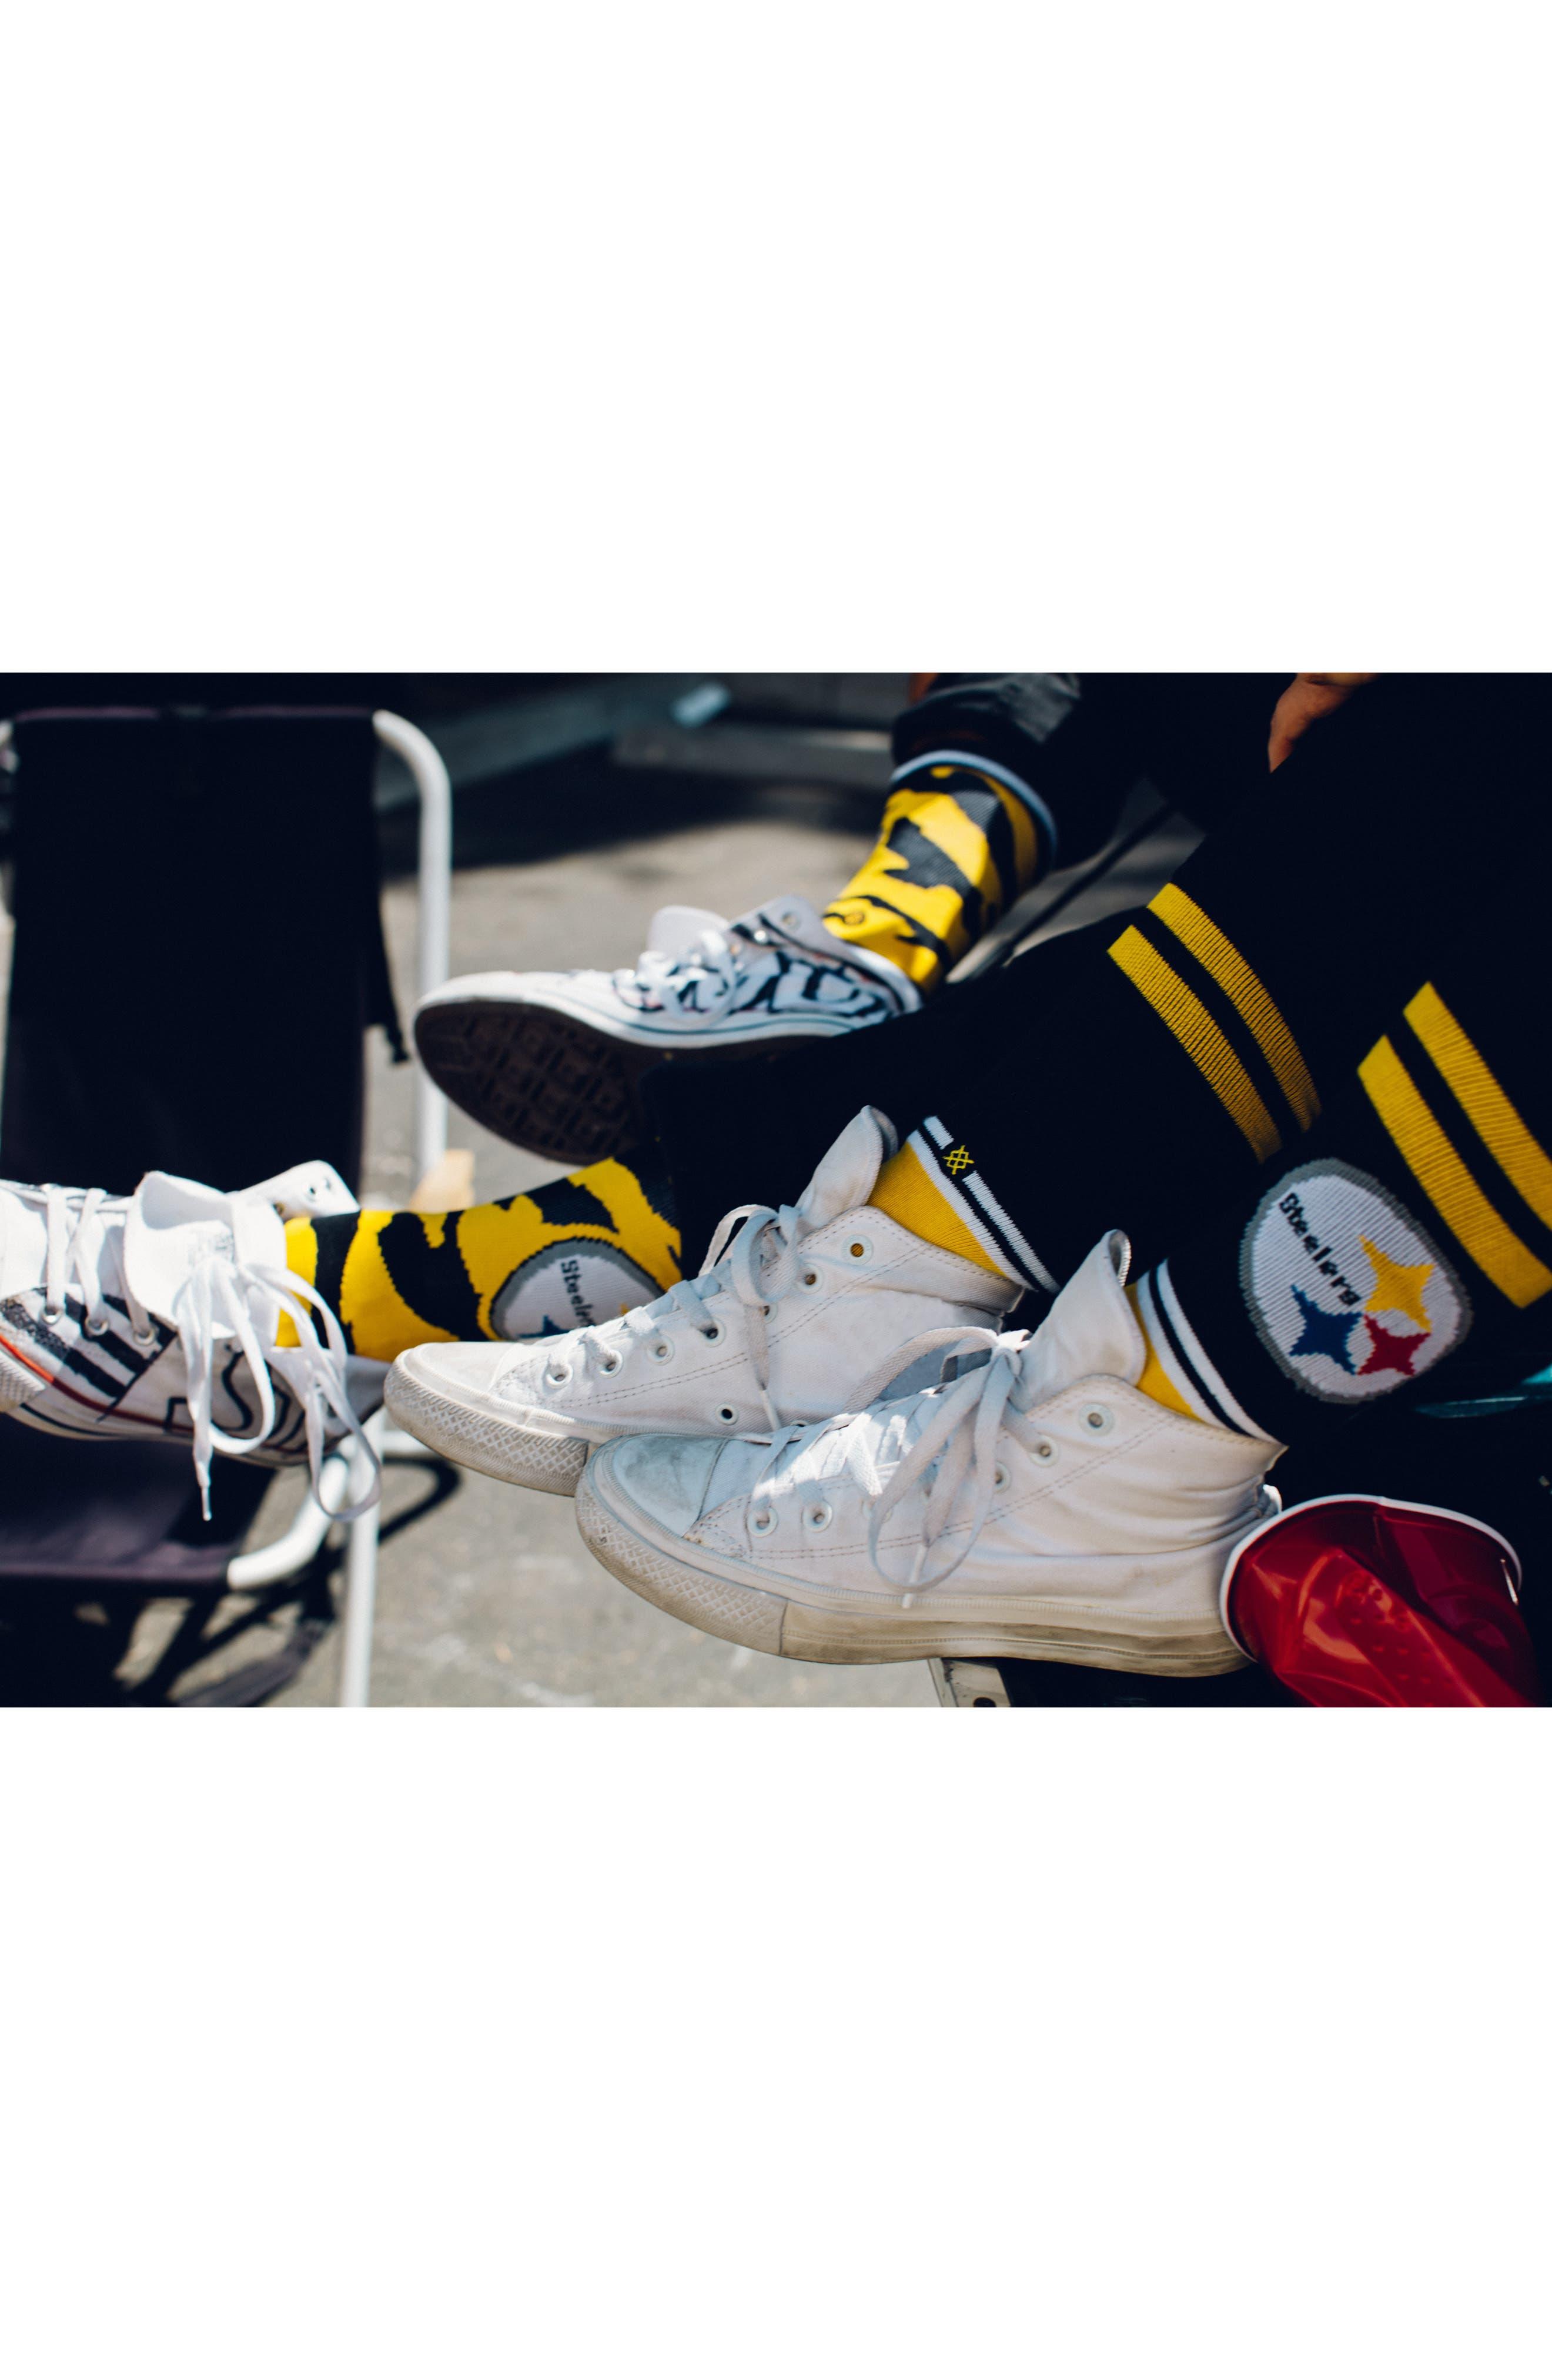 Pittsburgh Steelers - Fade Socks,                             Alternate thumbnail 7, color,                             YELLOW